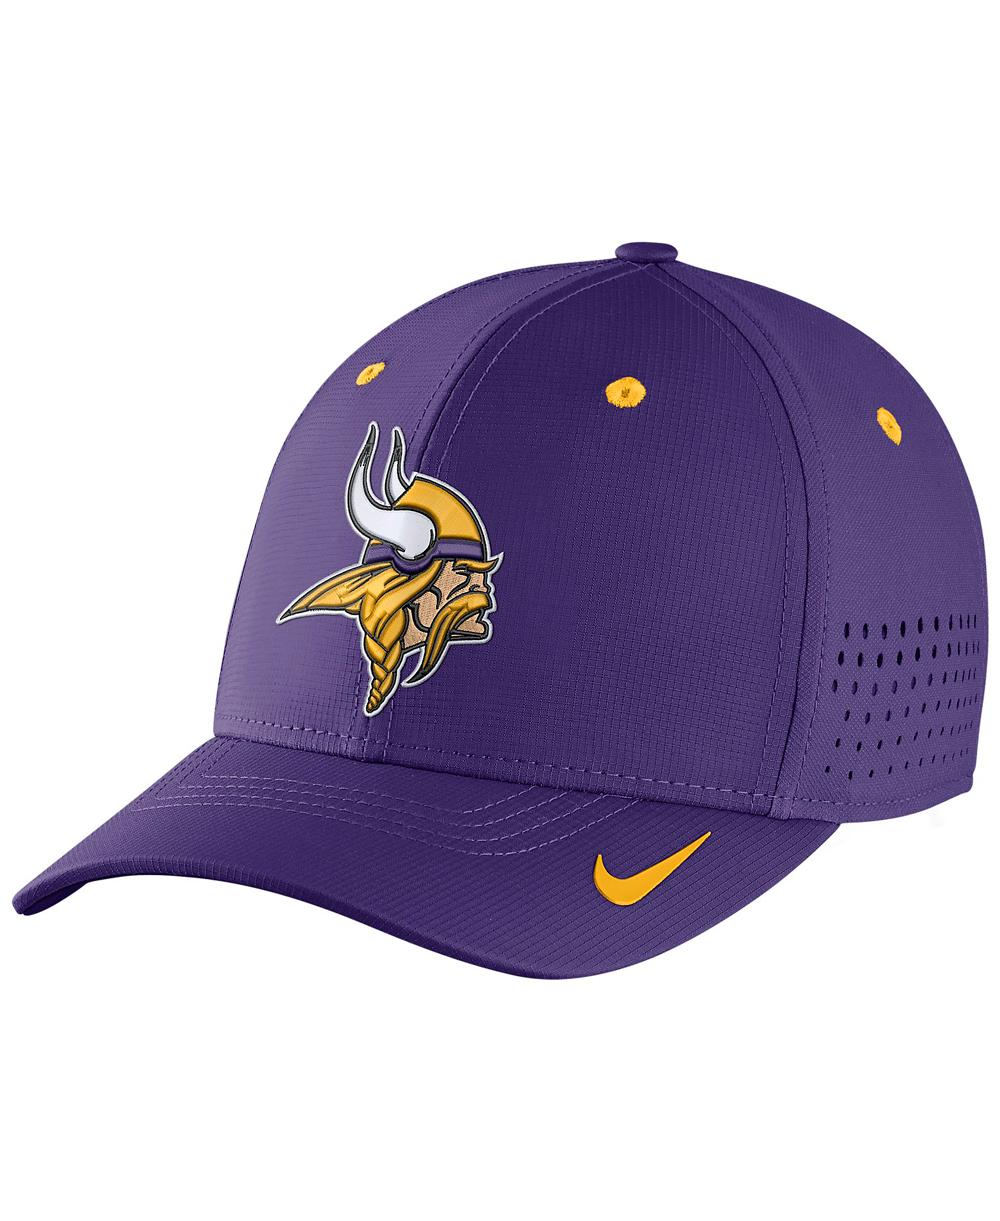 Legacy Vapor Swoosh Flex Gorra para Hombre NFL Vikings